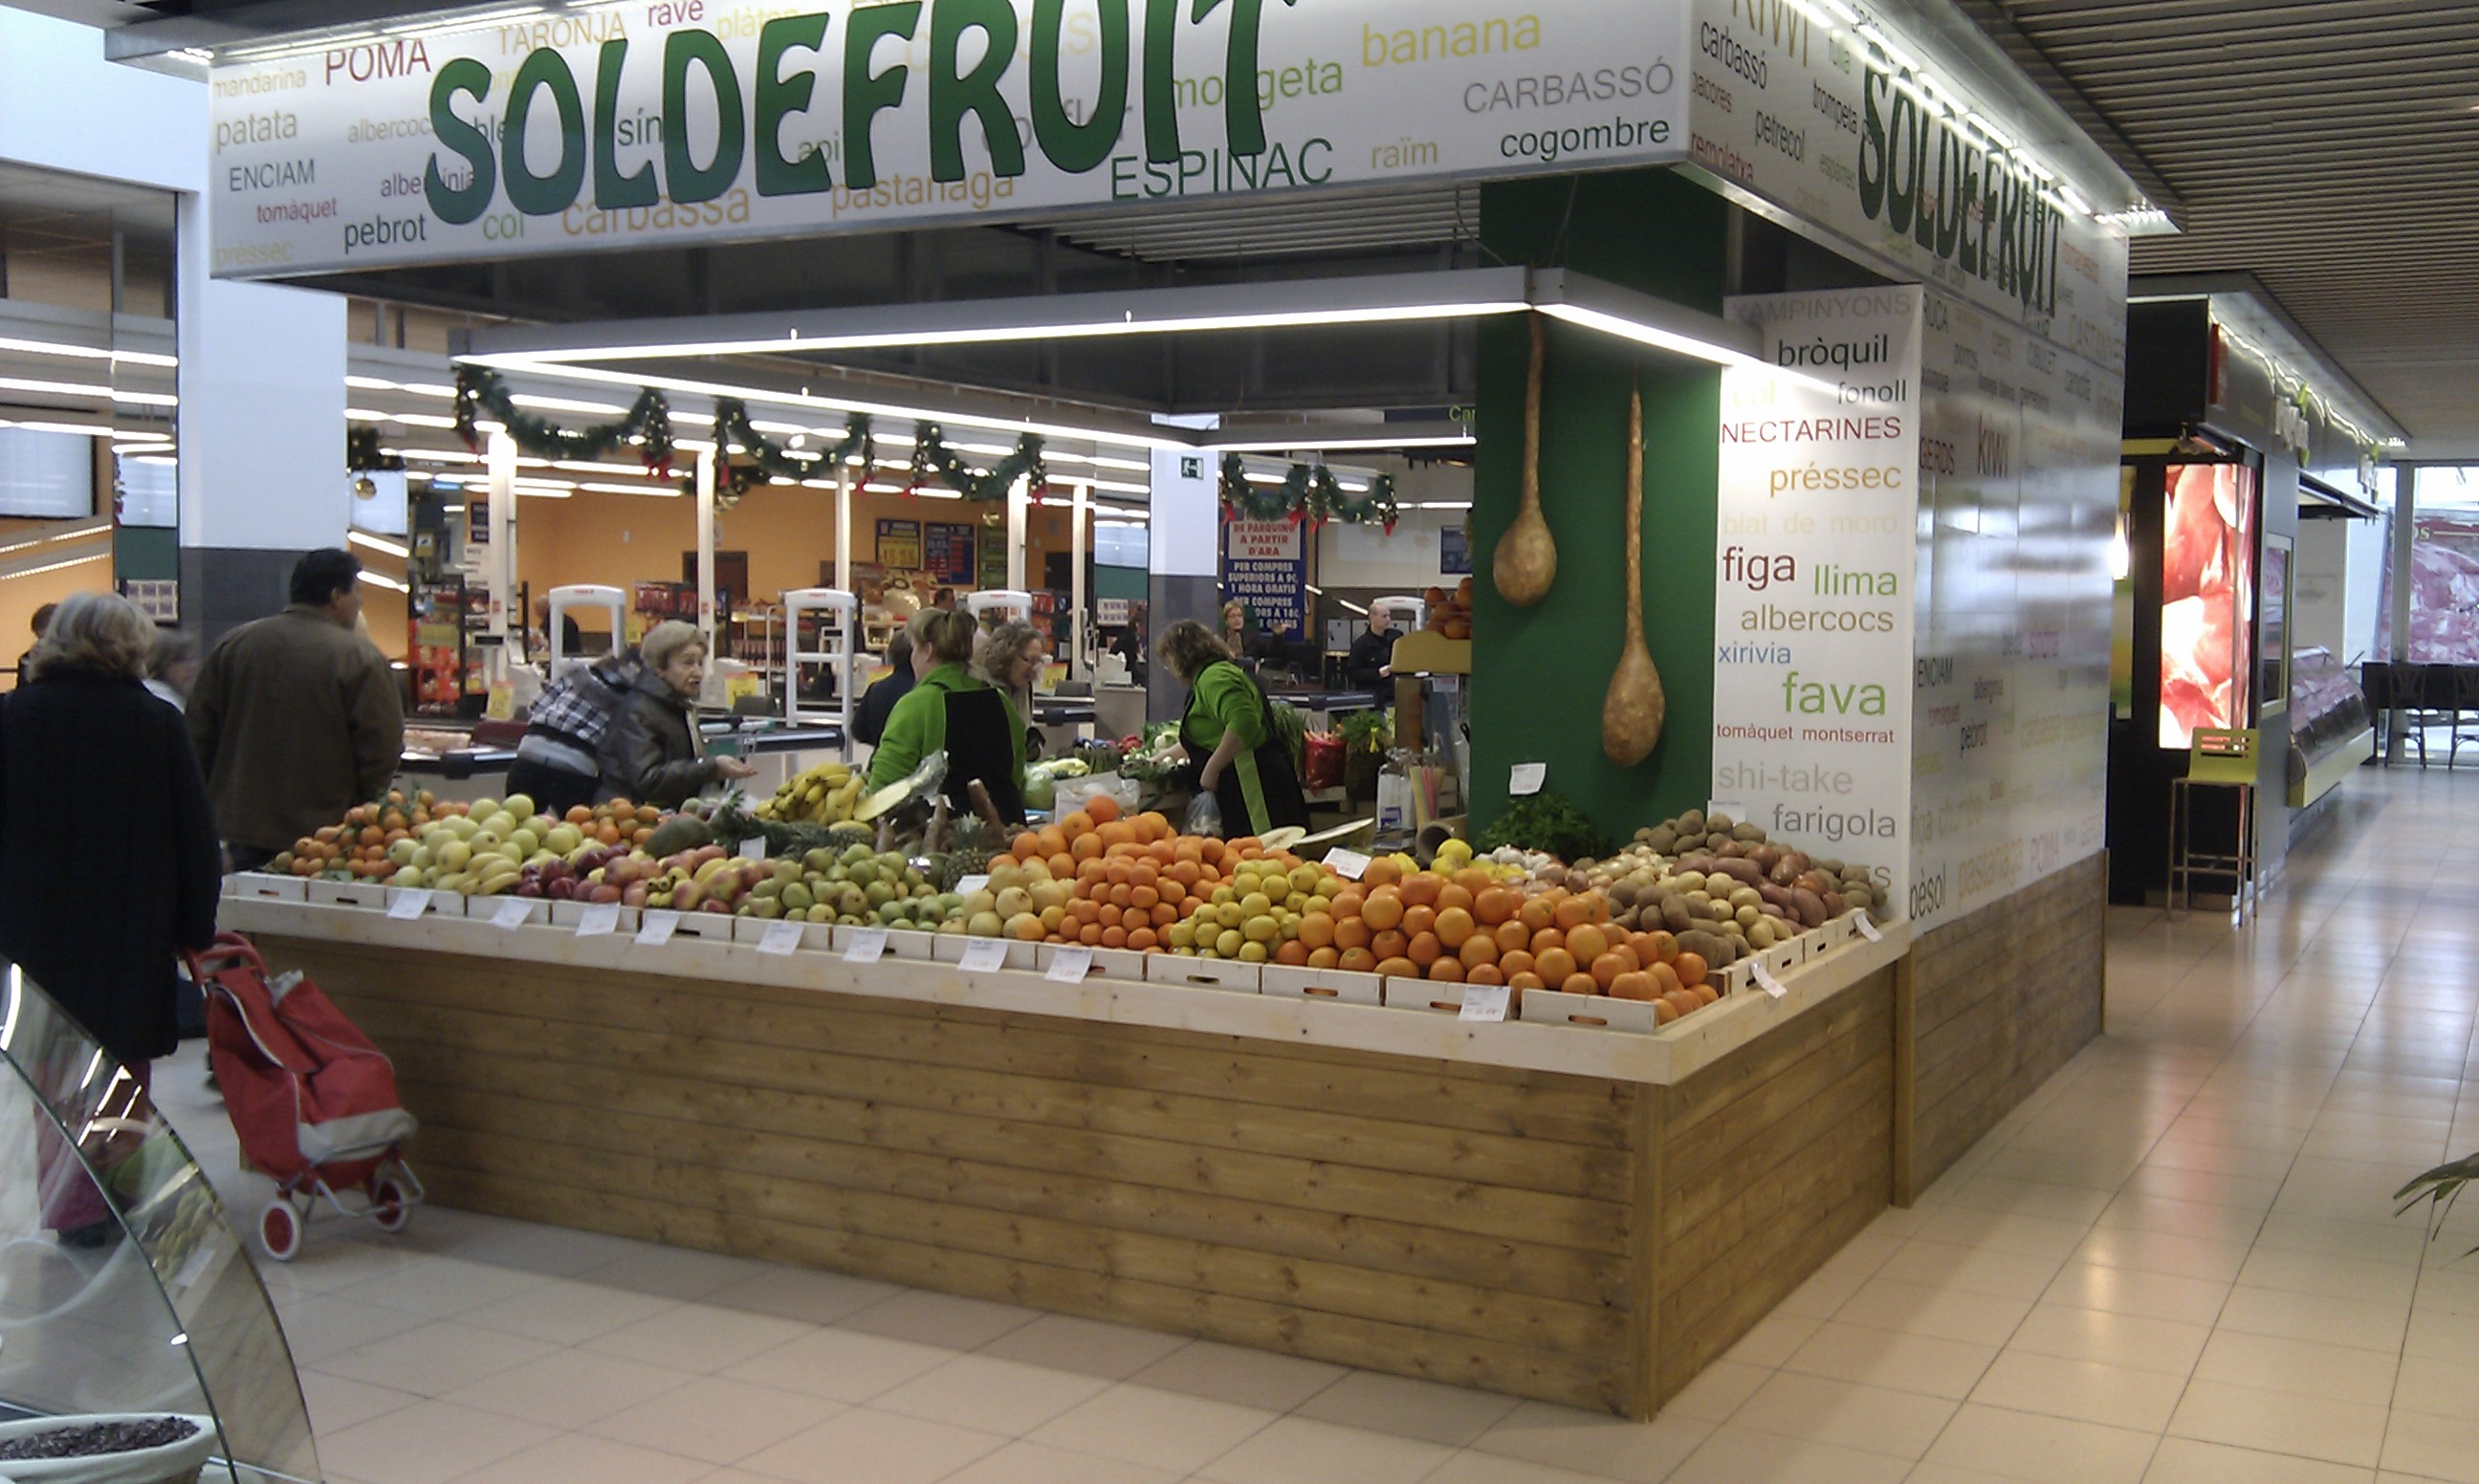 El Mercado Municipal de Cappont en Lleida, completa su oferta comercial.